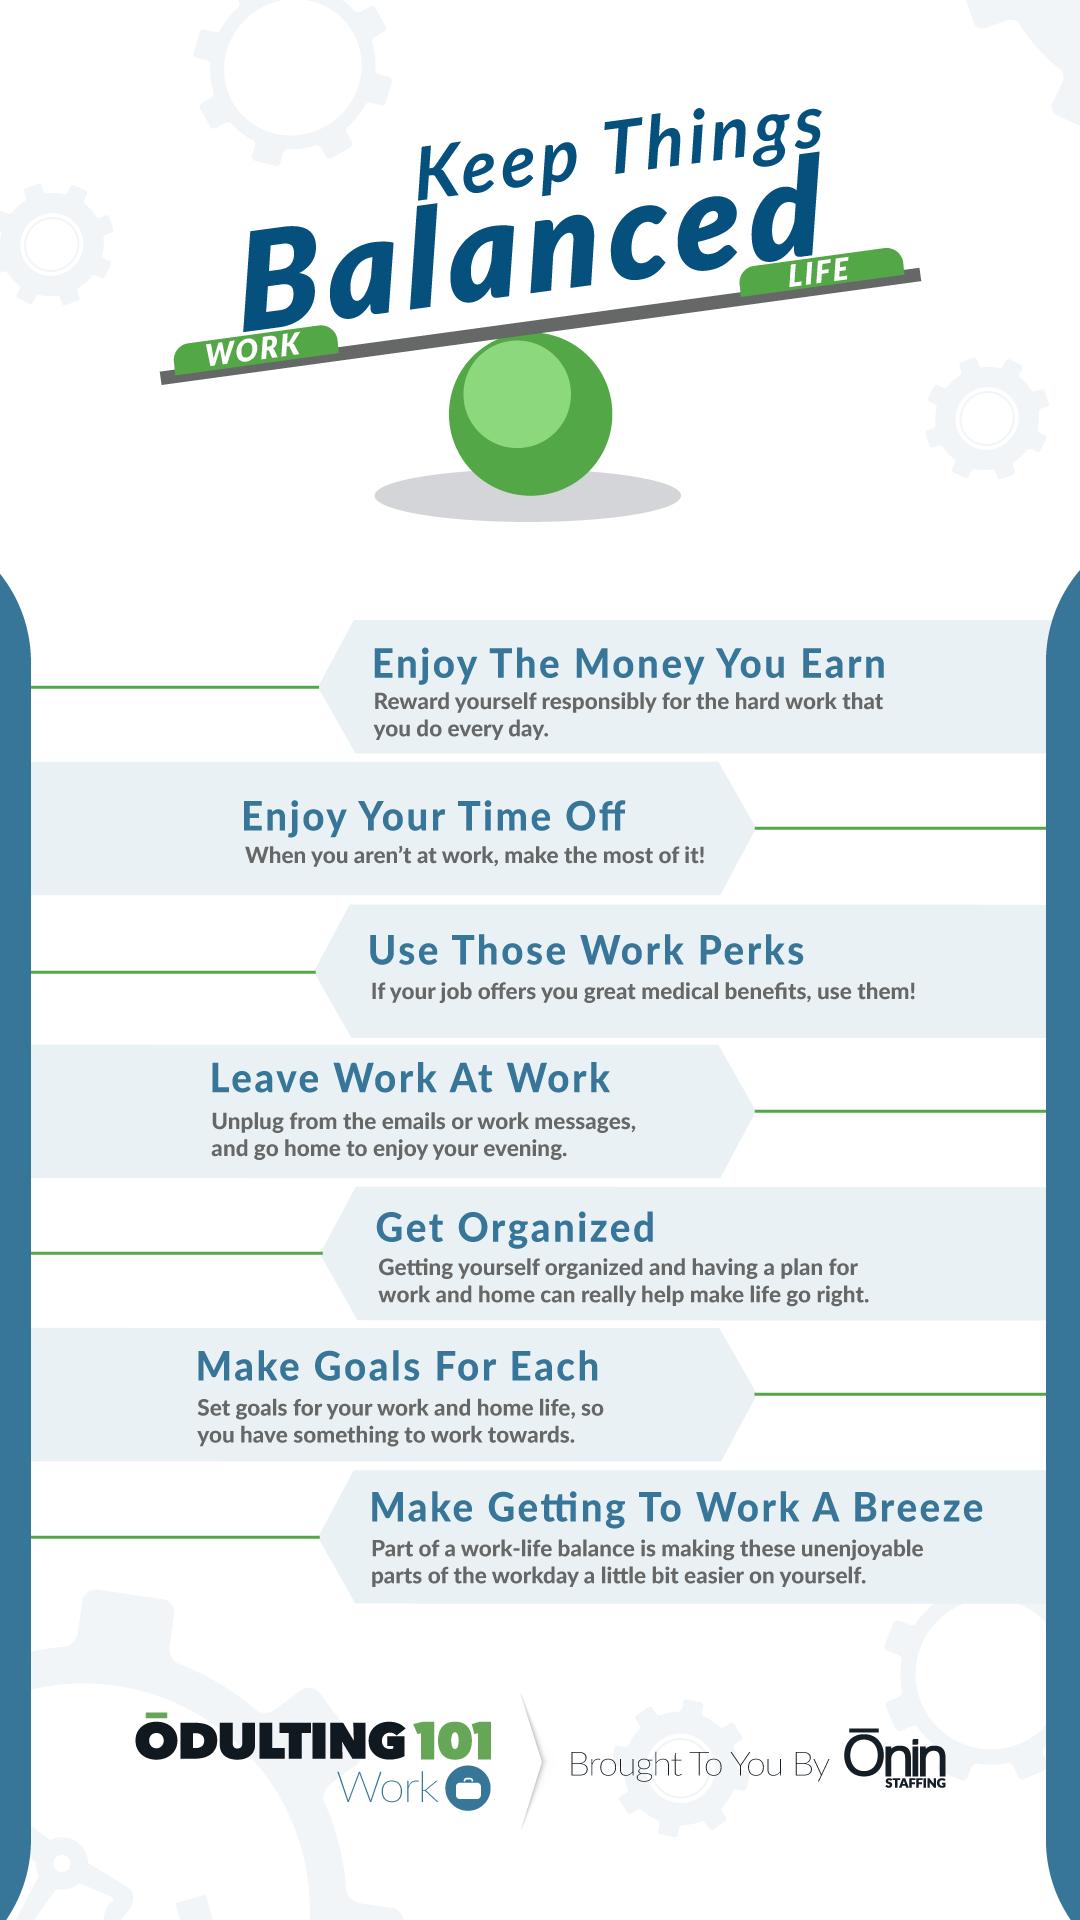 202005_IB_Work-Life-Balance_infographic_DIG_FINAL